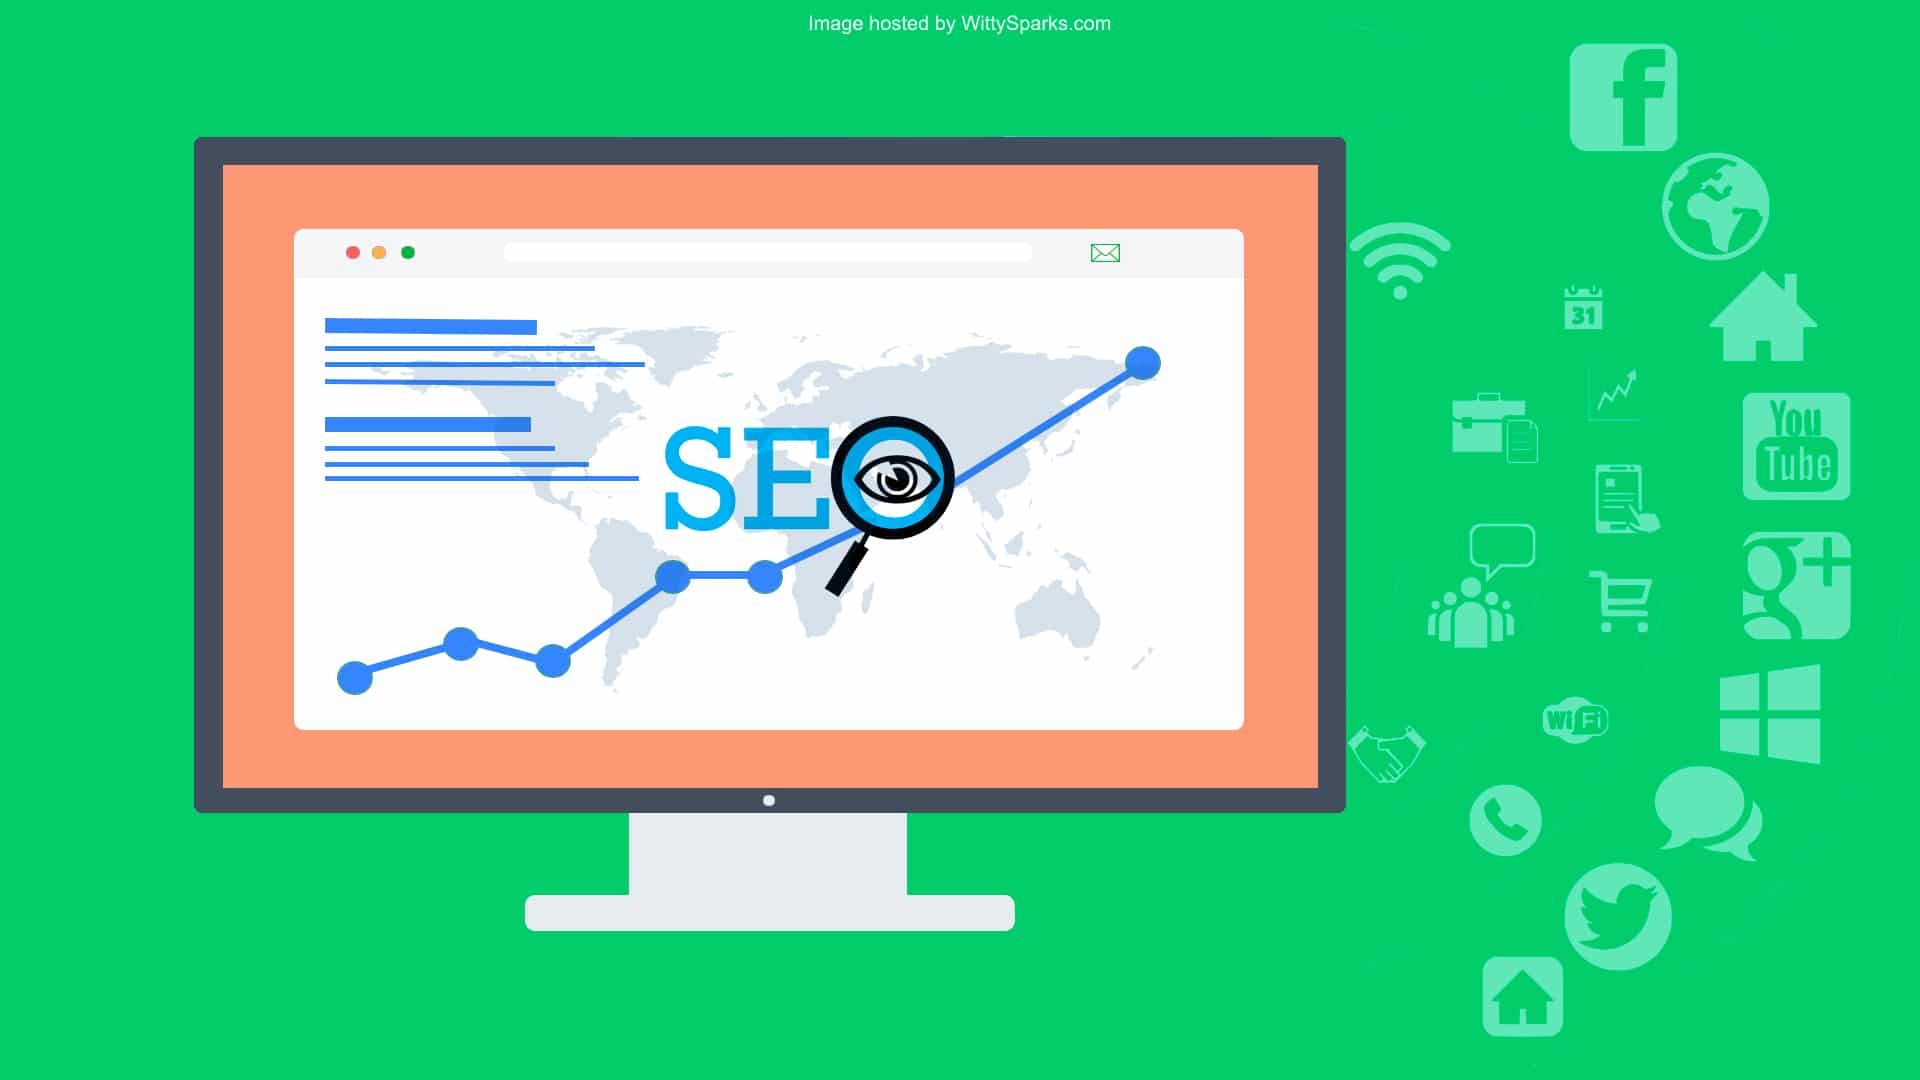 Social Media Marketing Strategies for SEO